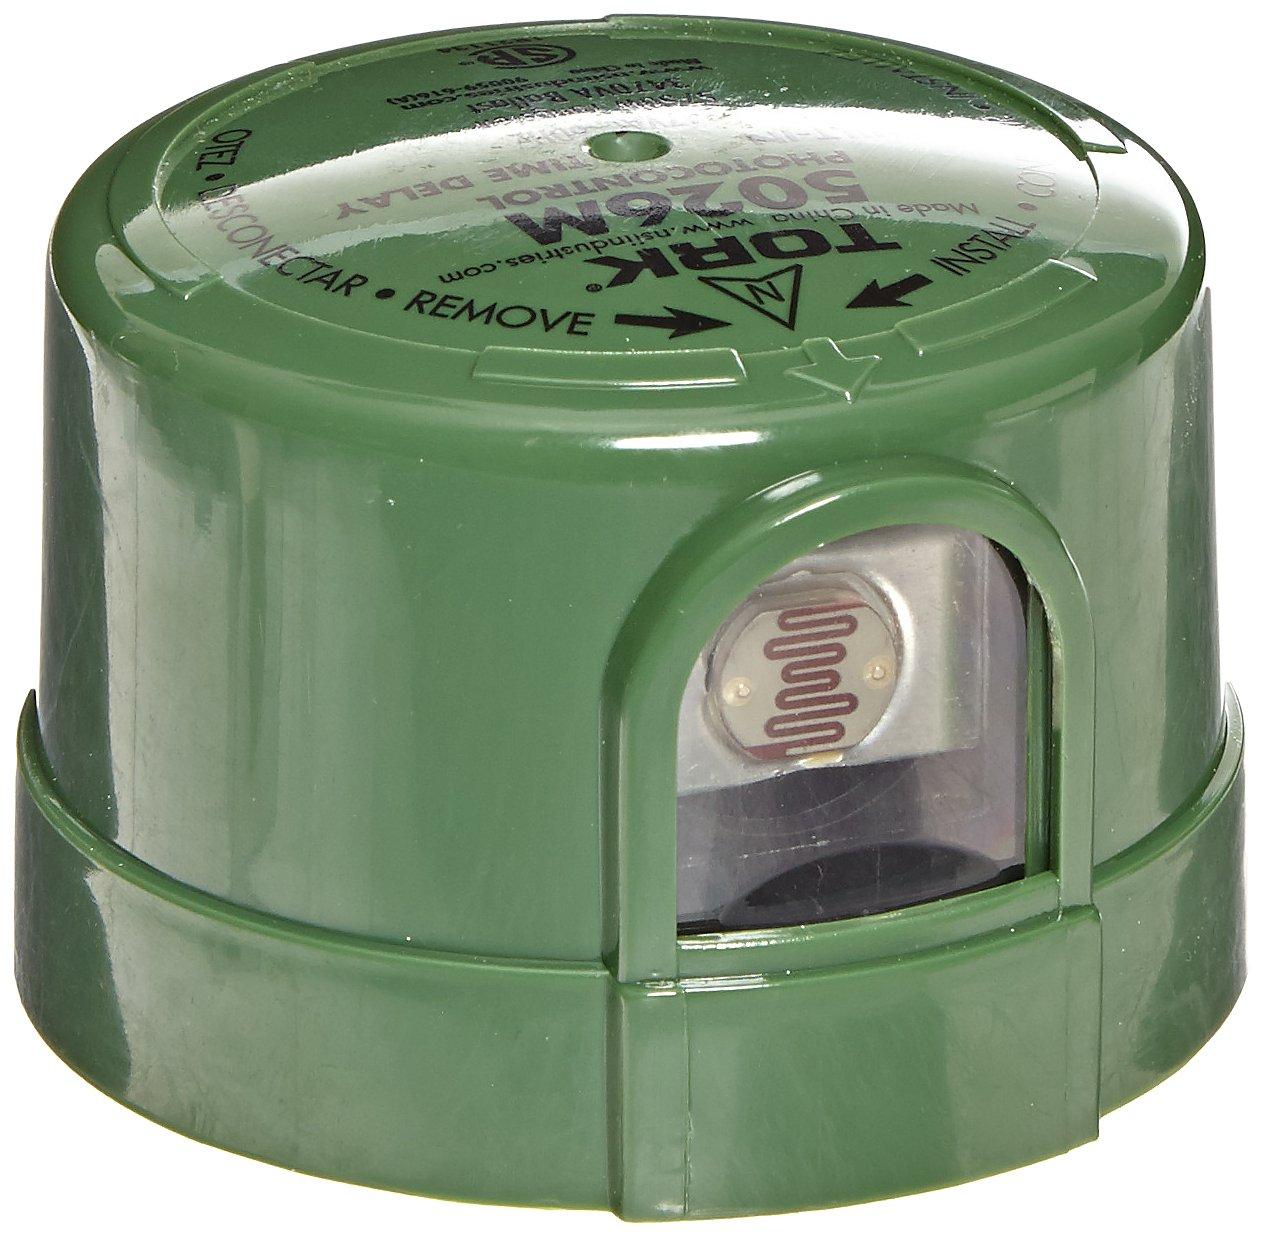 NSI Industries 5026M Delayed Response Utility Grade MOV Surge Arrestor Photocontrol, 347 VAC Voltage